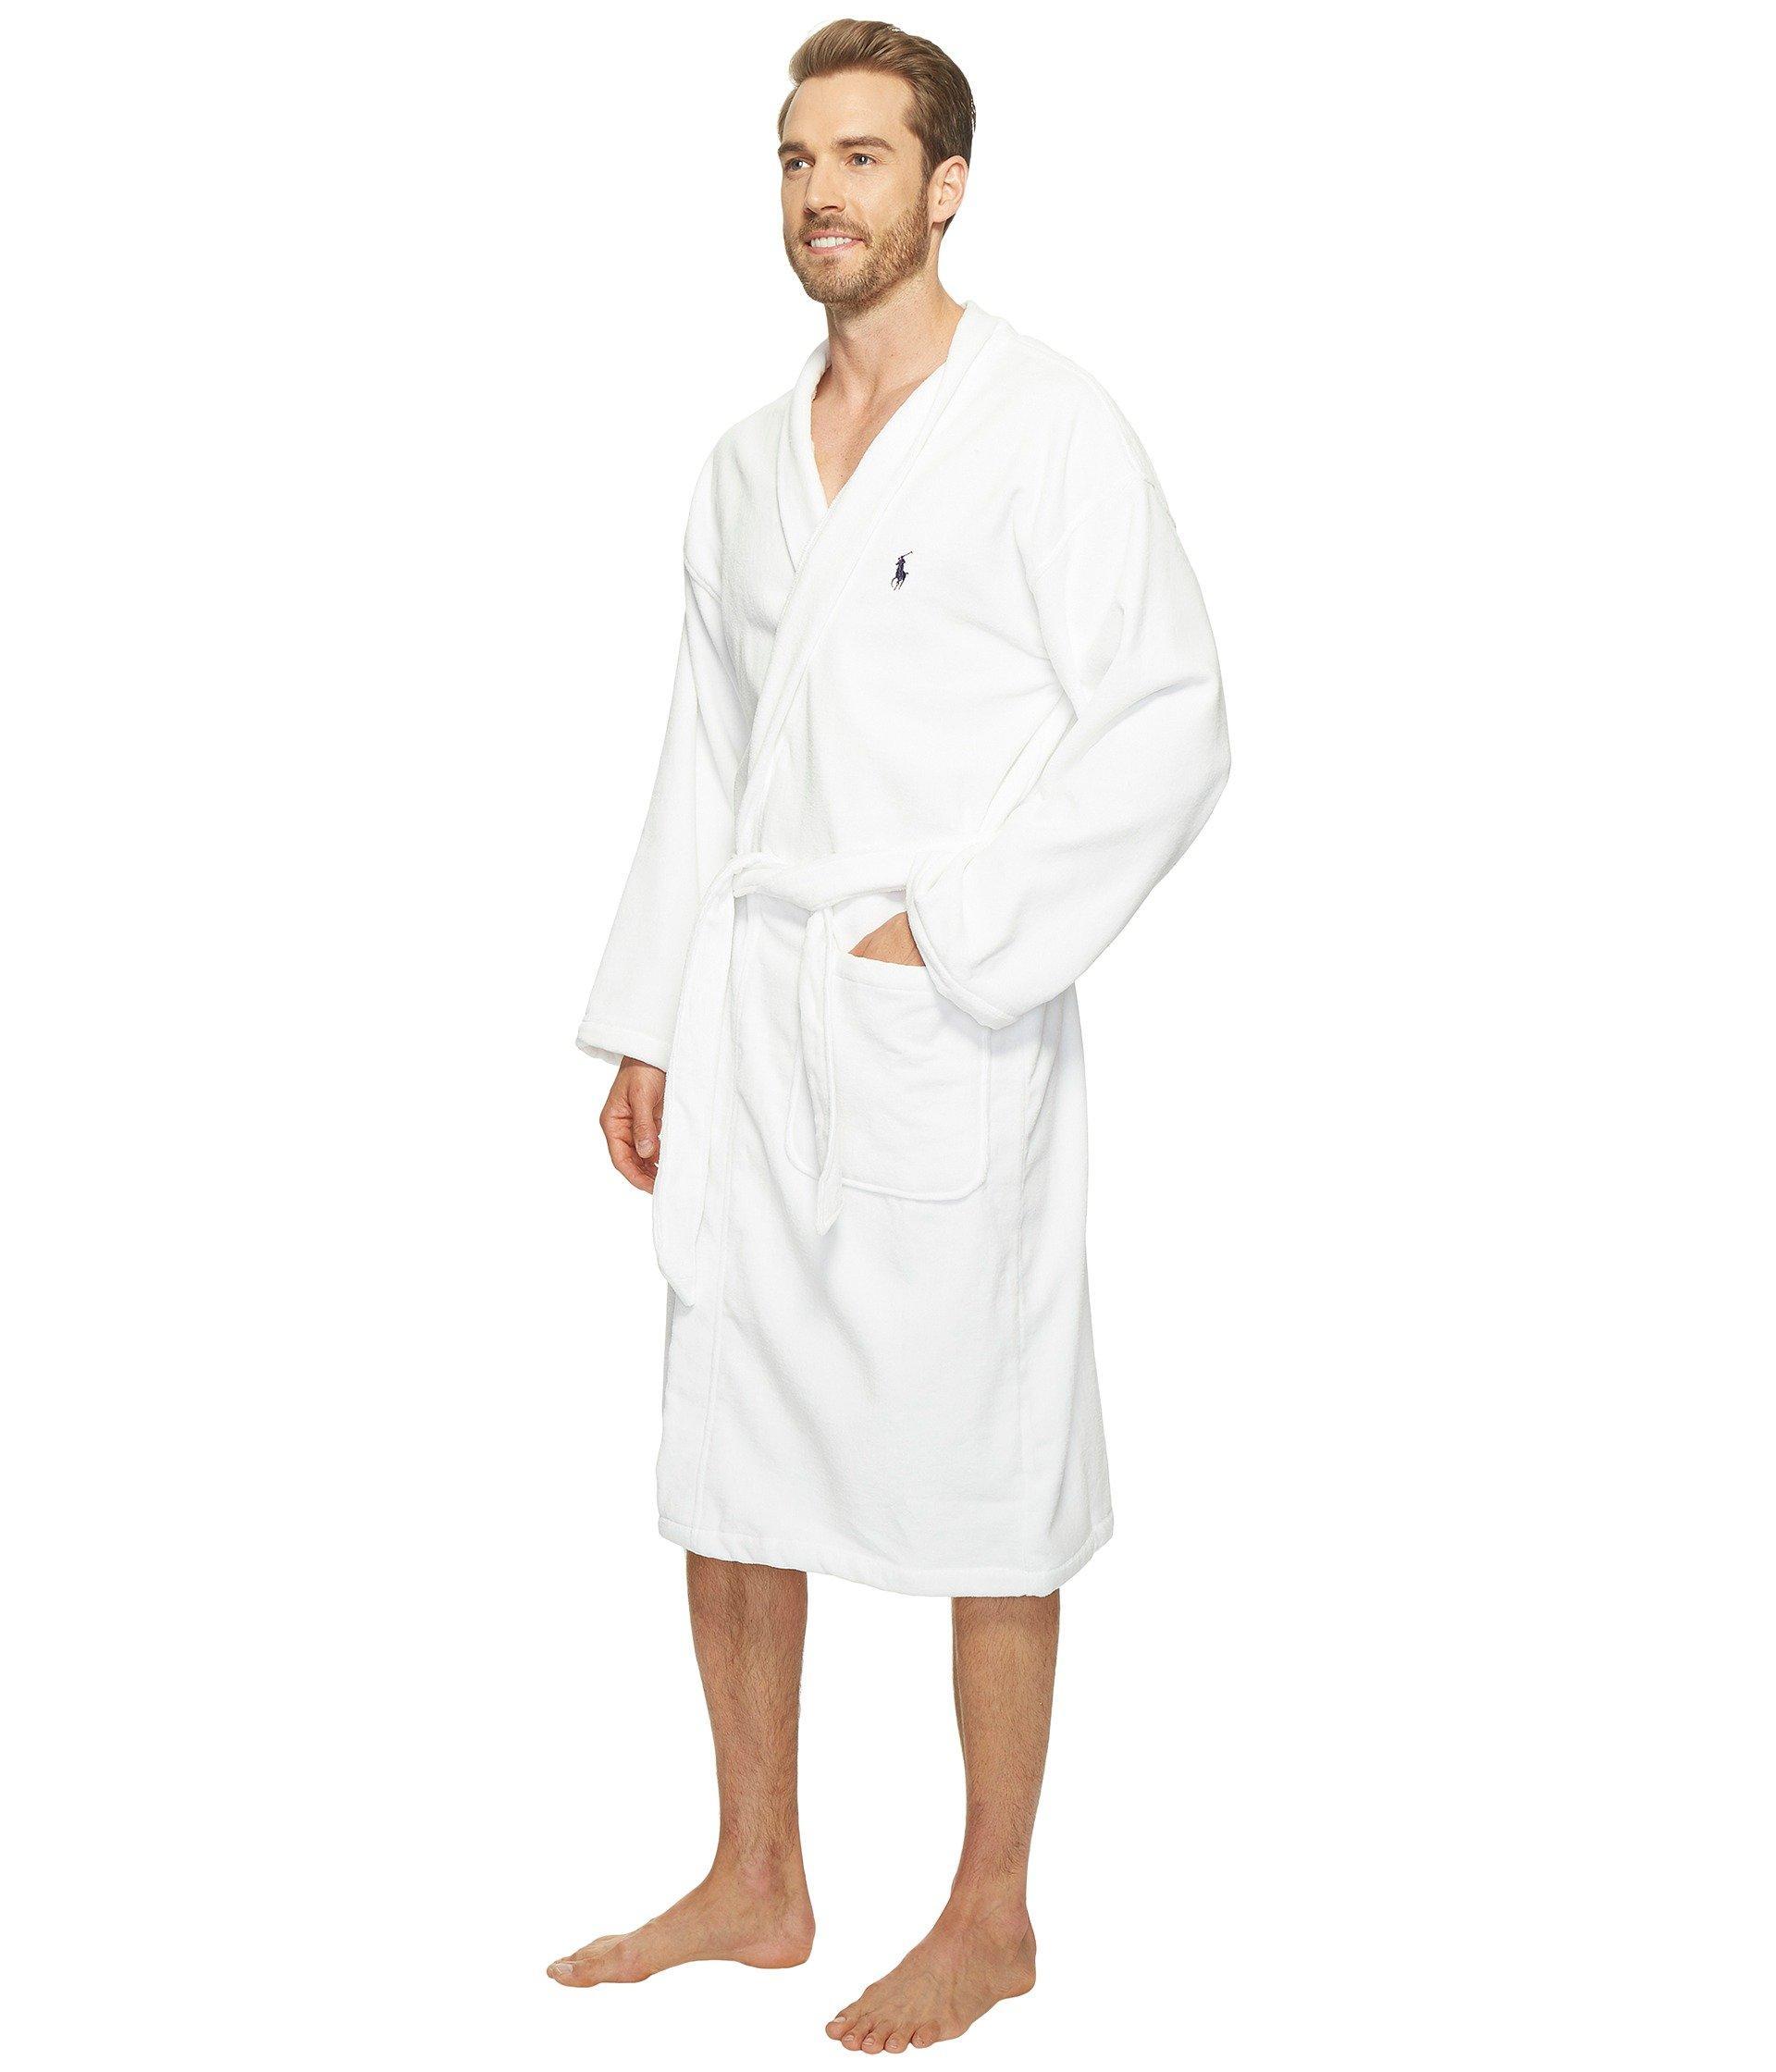 Lyst - Polo Ralph Lauren Terry Shawl Robe (white) Men s Robe in White for  Men d744ce4394f